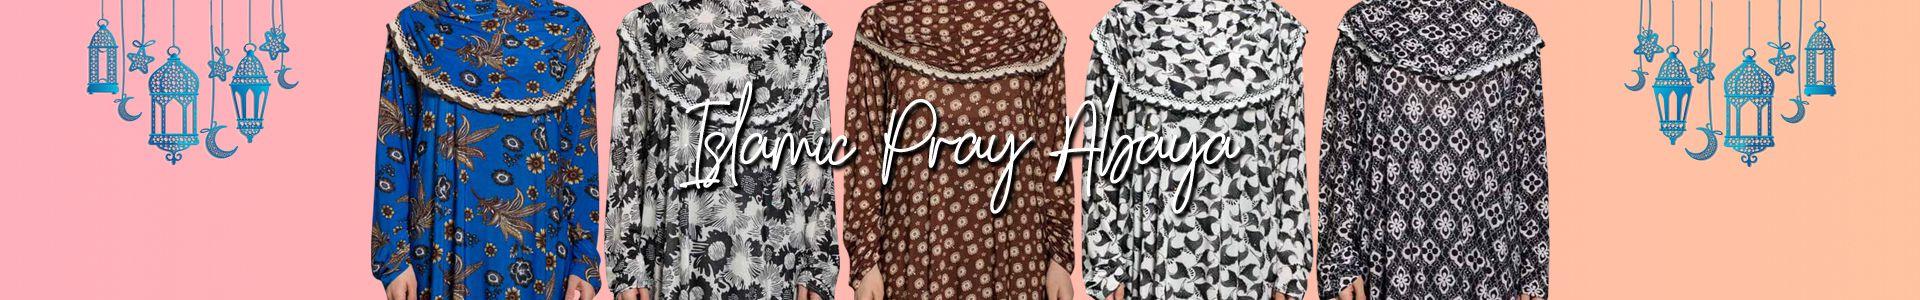 Islamic Pray Abaya Usd $ 7.99